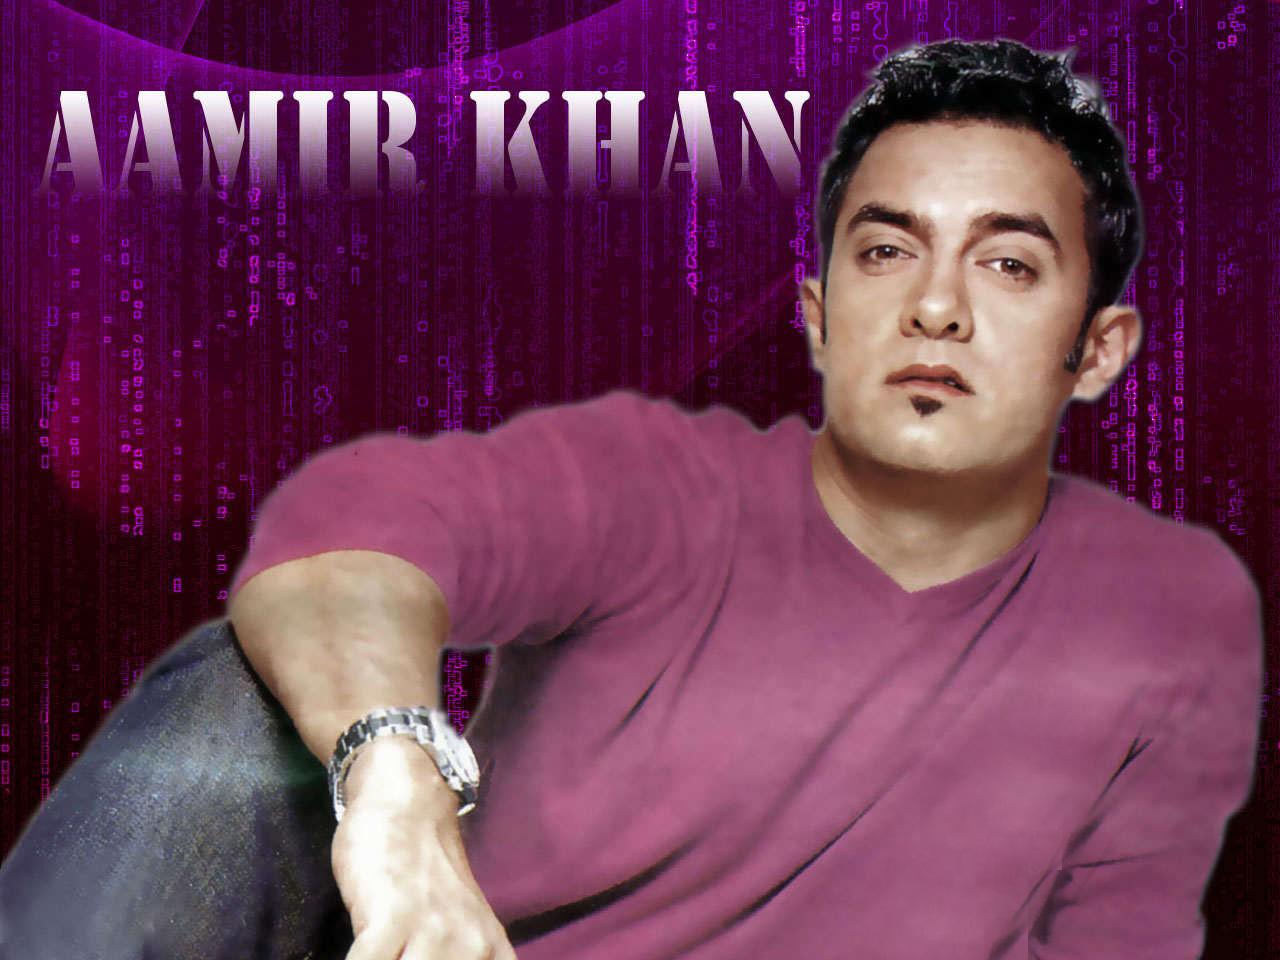 Aamir khan wallpapers 2015 aamir khan wallpapers 2015 aamir khan